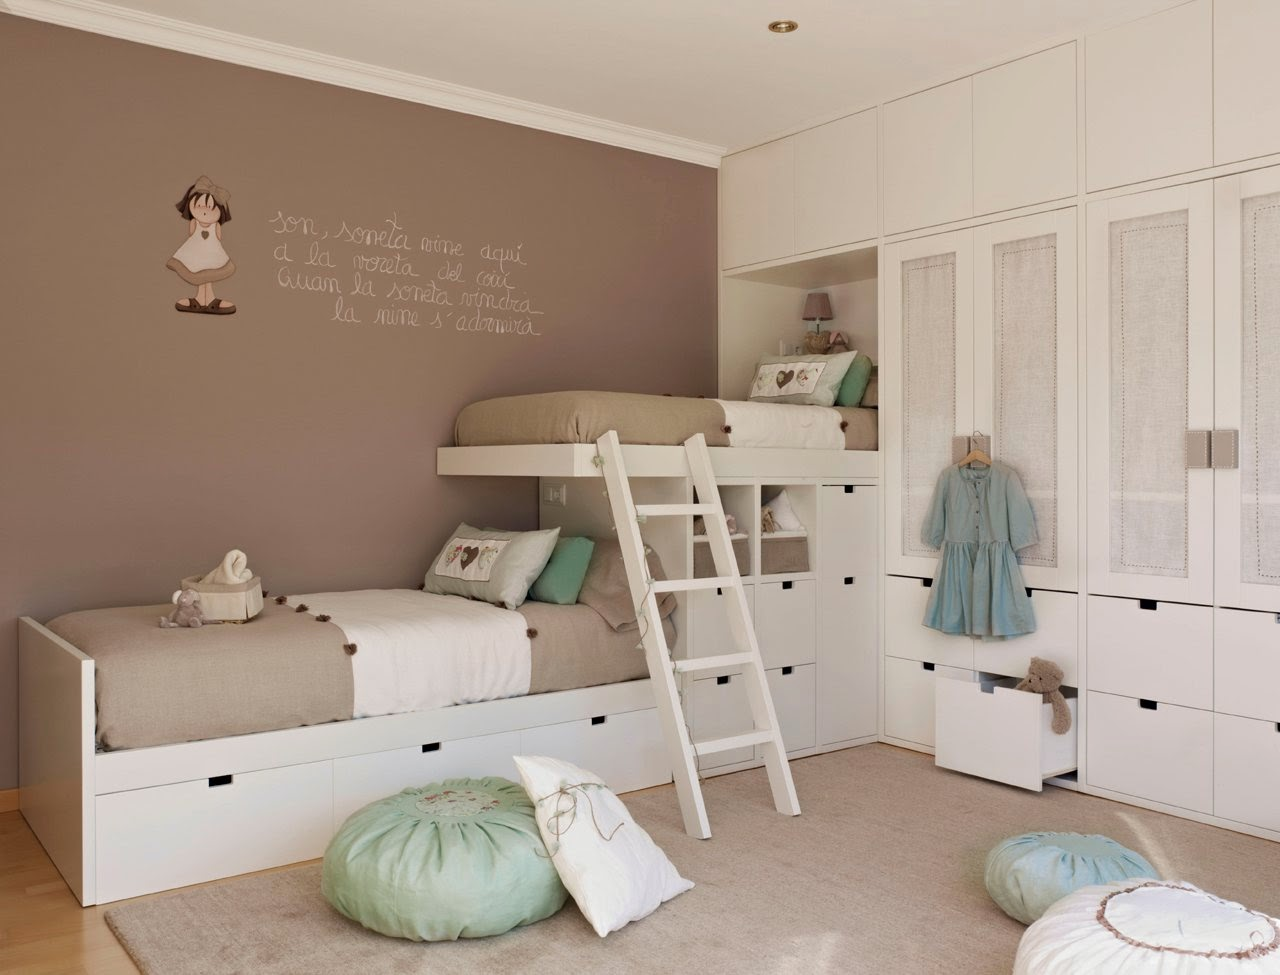 Habitacion infantil con literas 1280x975